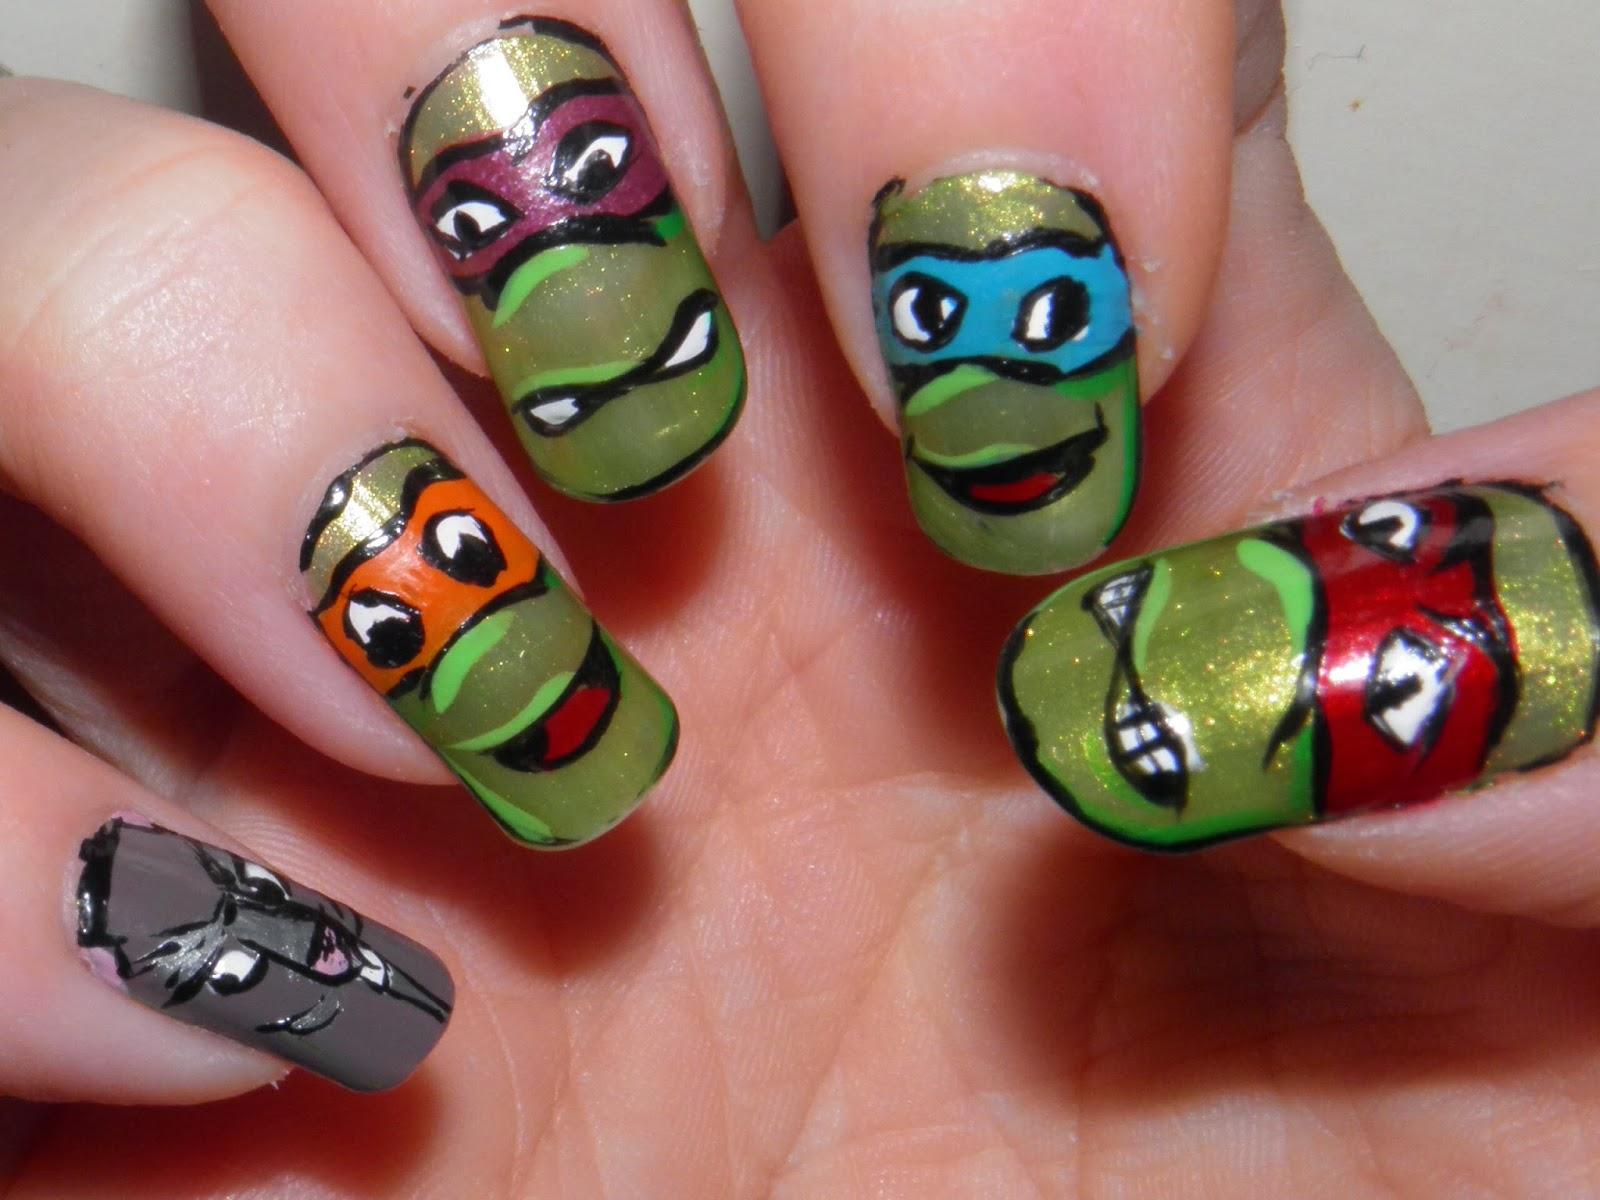 Streams of Whiskey and Nail Polish: Teenage Mutant Ninja Turtles